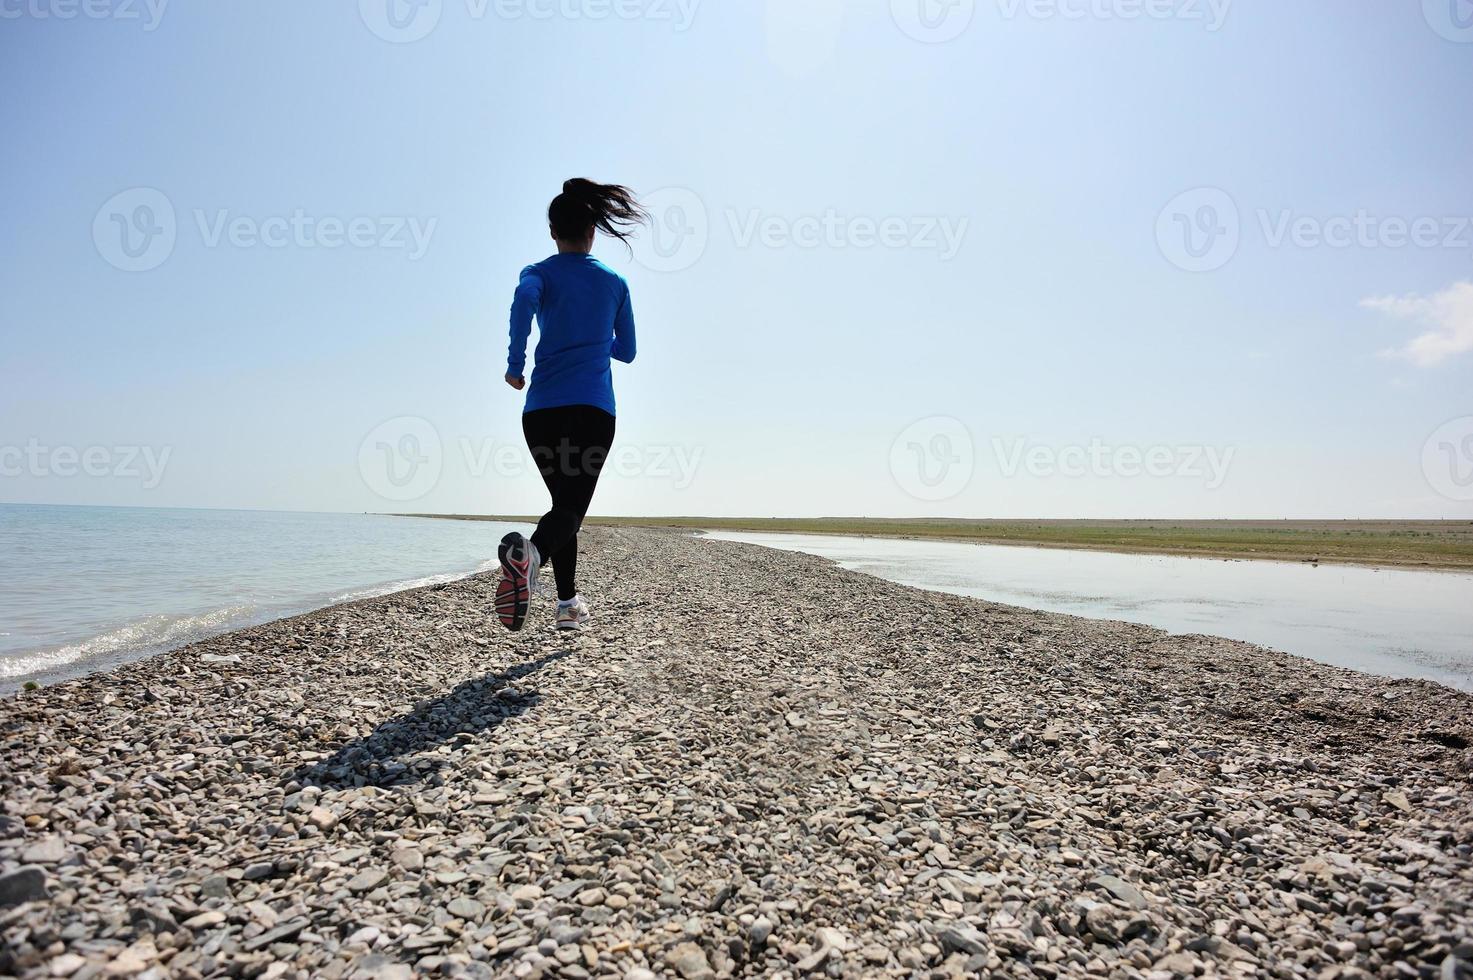 atleta corredor corriendo en la playa foto